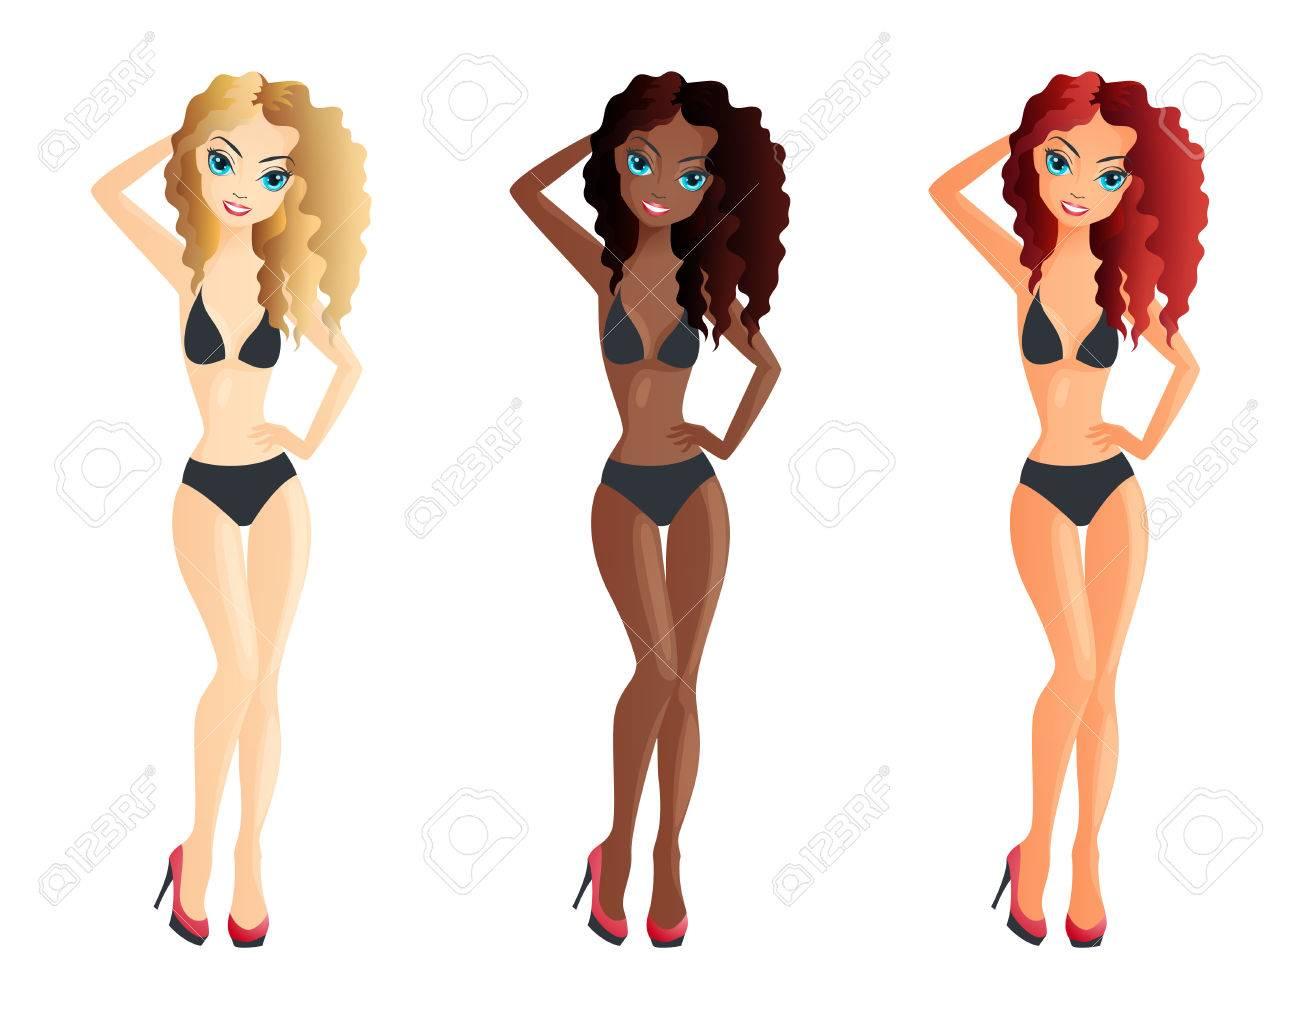 2d248faa250e6 Set Of Three Girls Wearing Bikini Swimsuit Royalty Free Cliparts ...